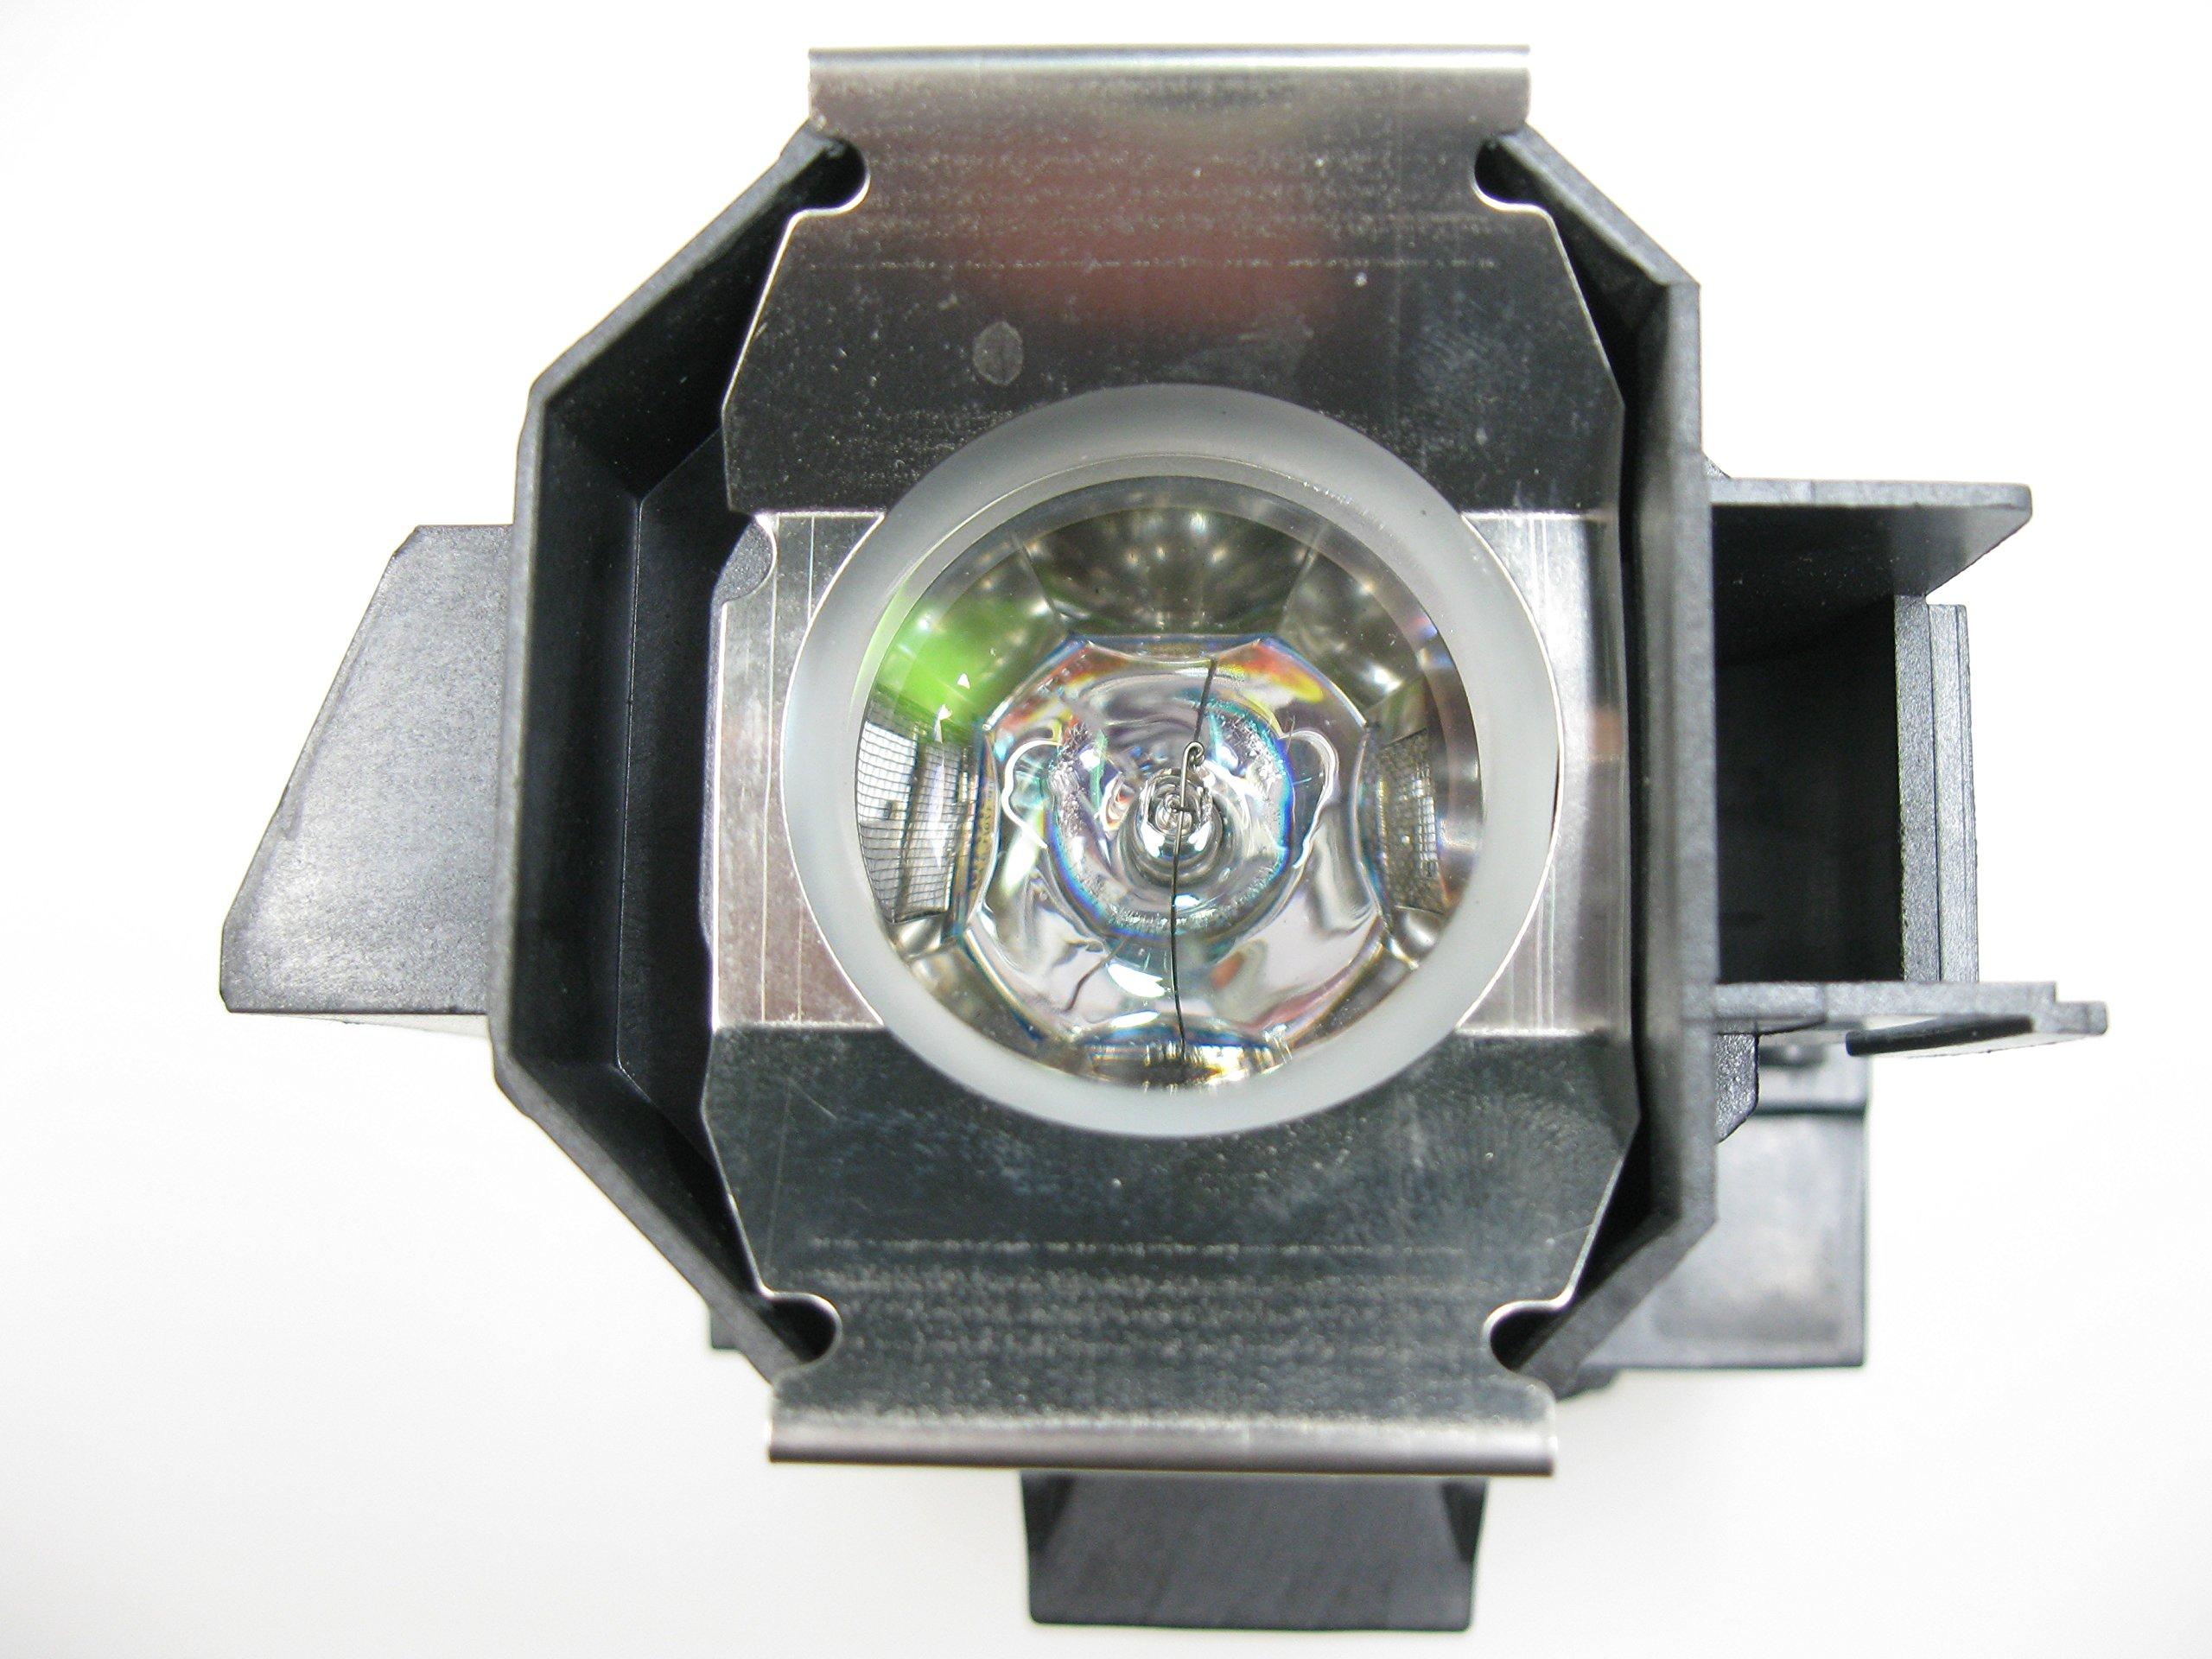 V7 VPL1506-1N Lamp for select Epson projectors